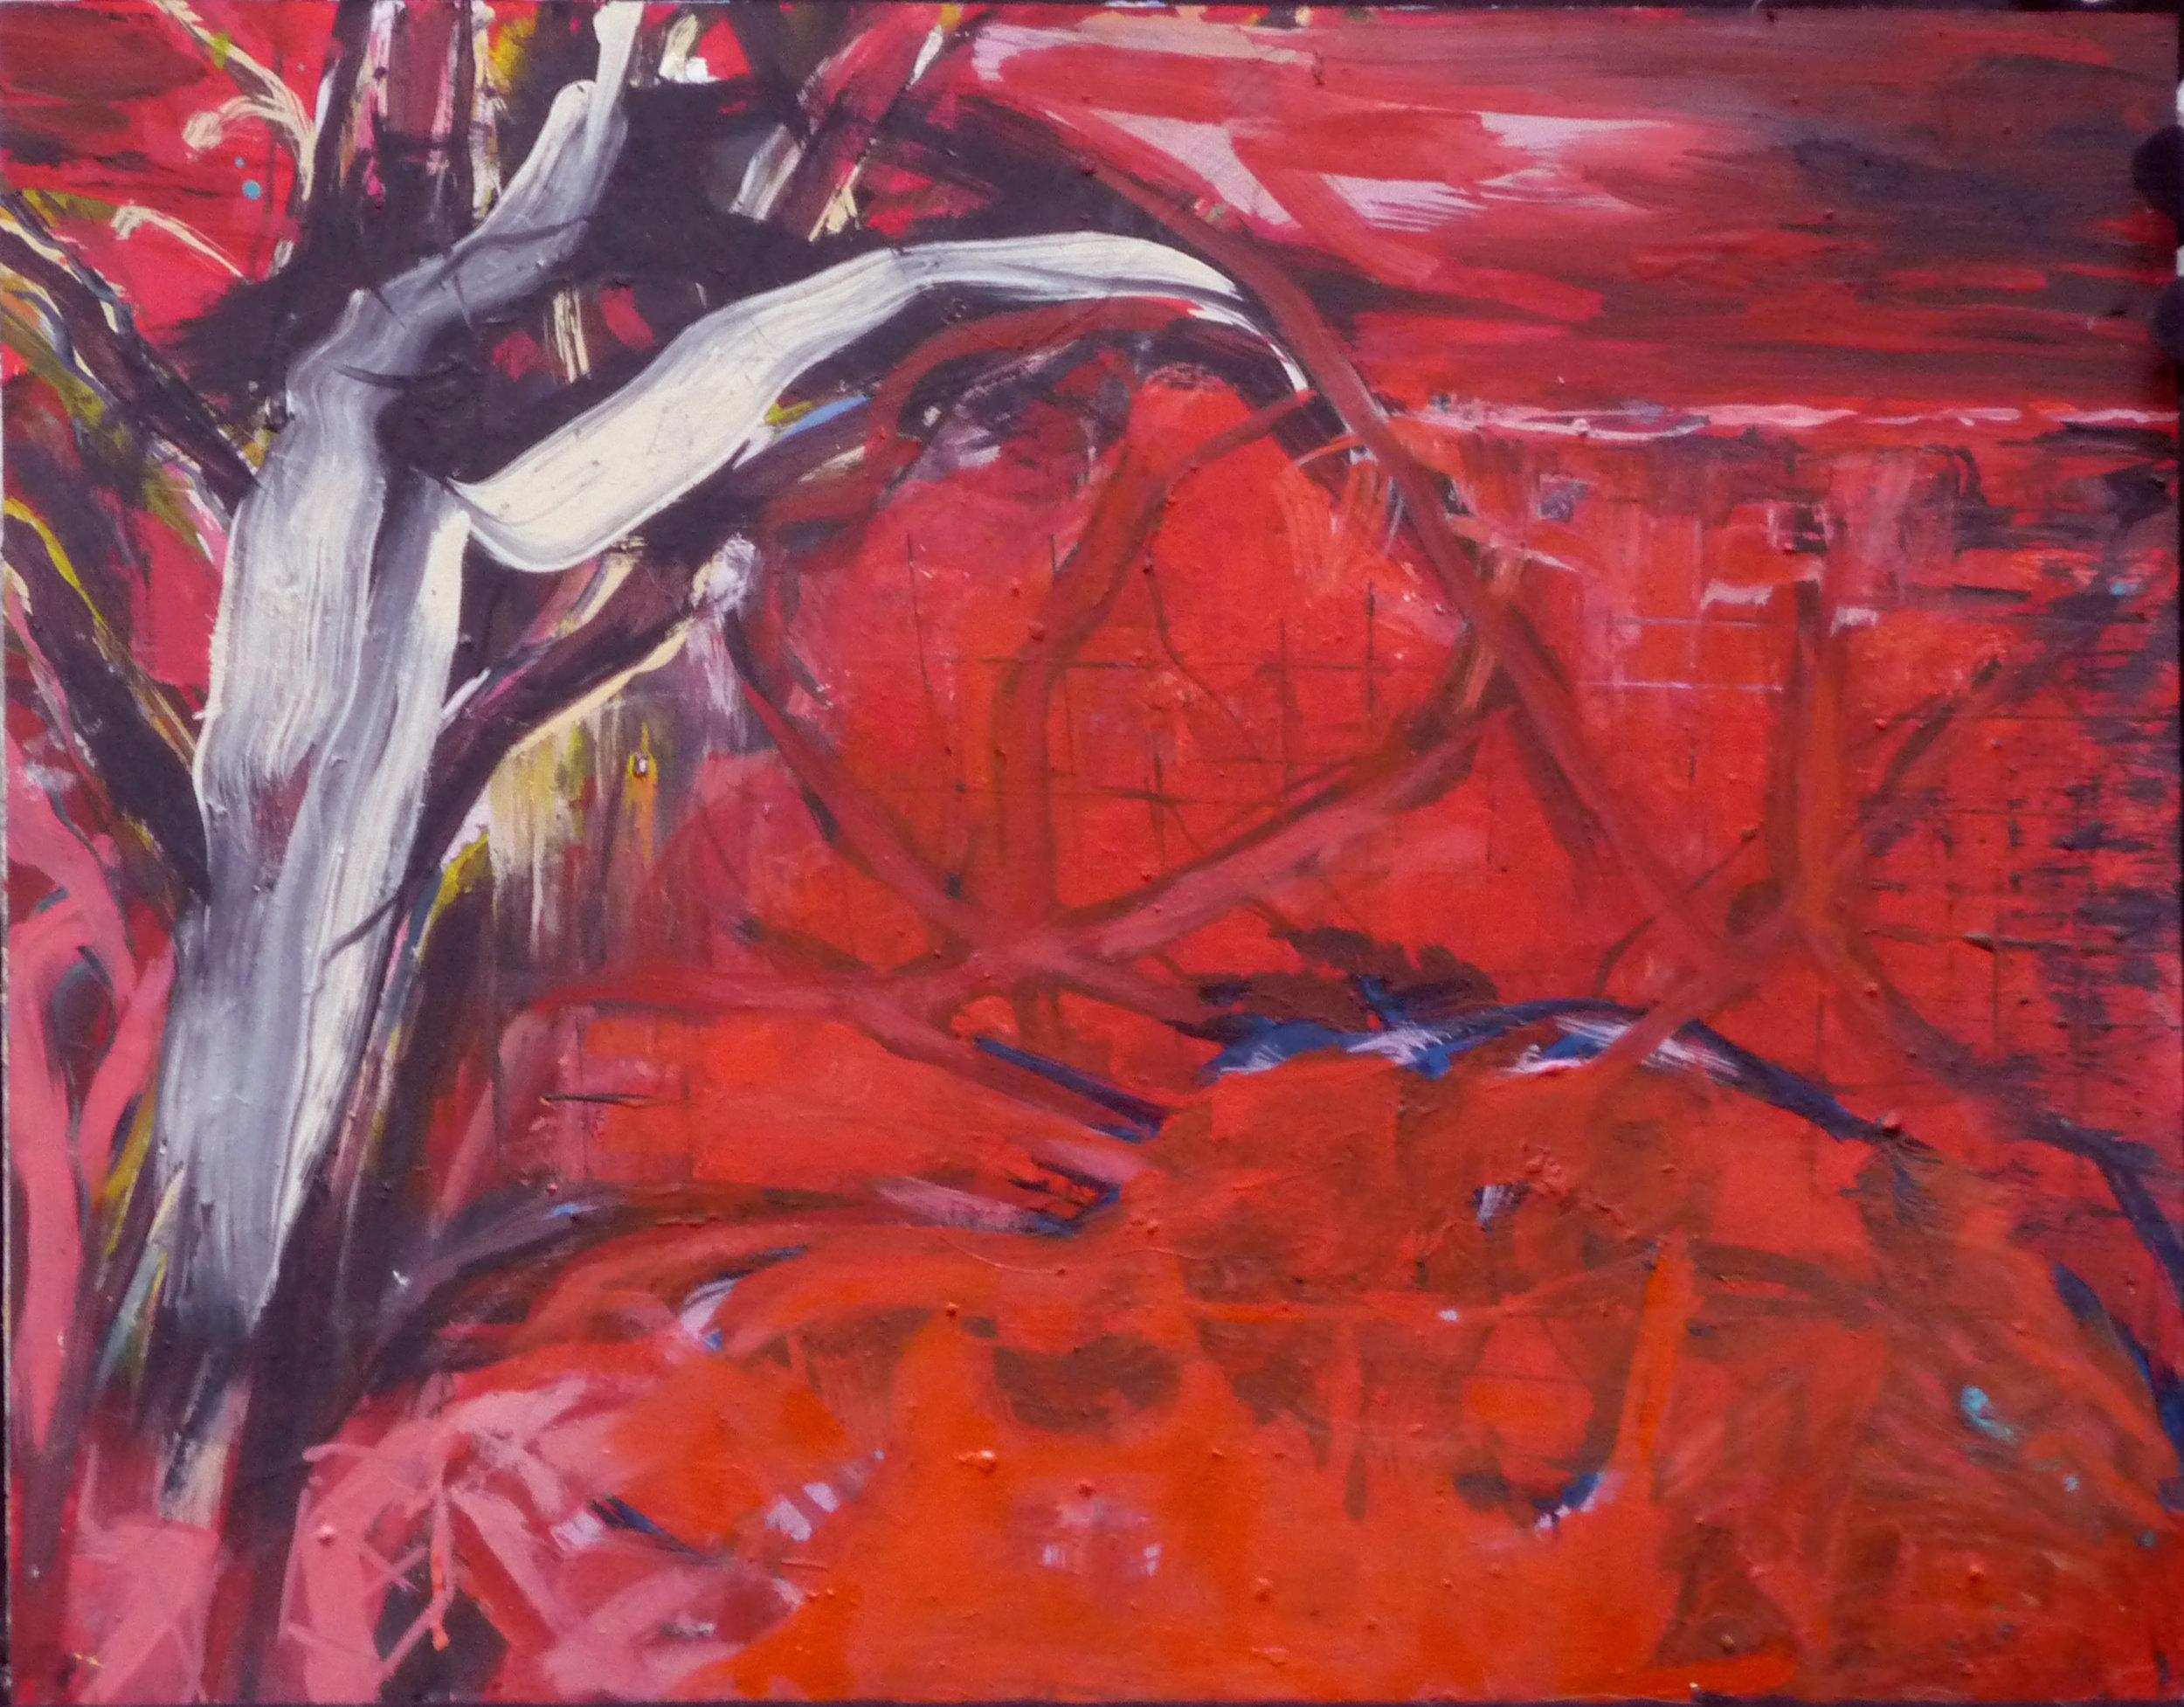 Boom aan muur, oil on canvas, 50 x 64 cm